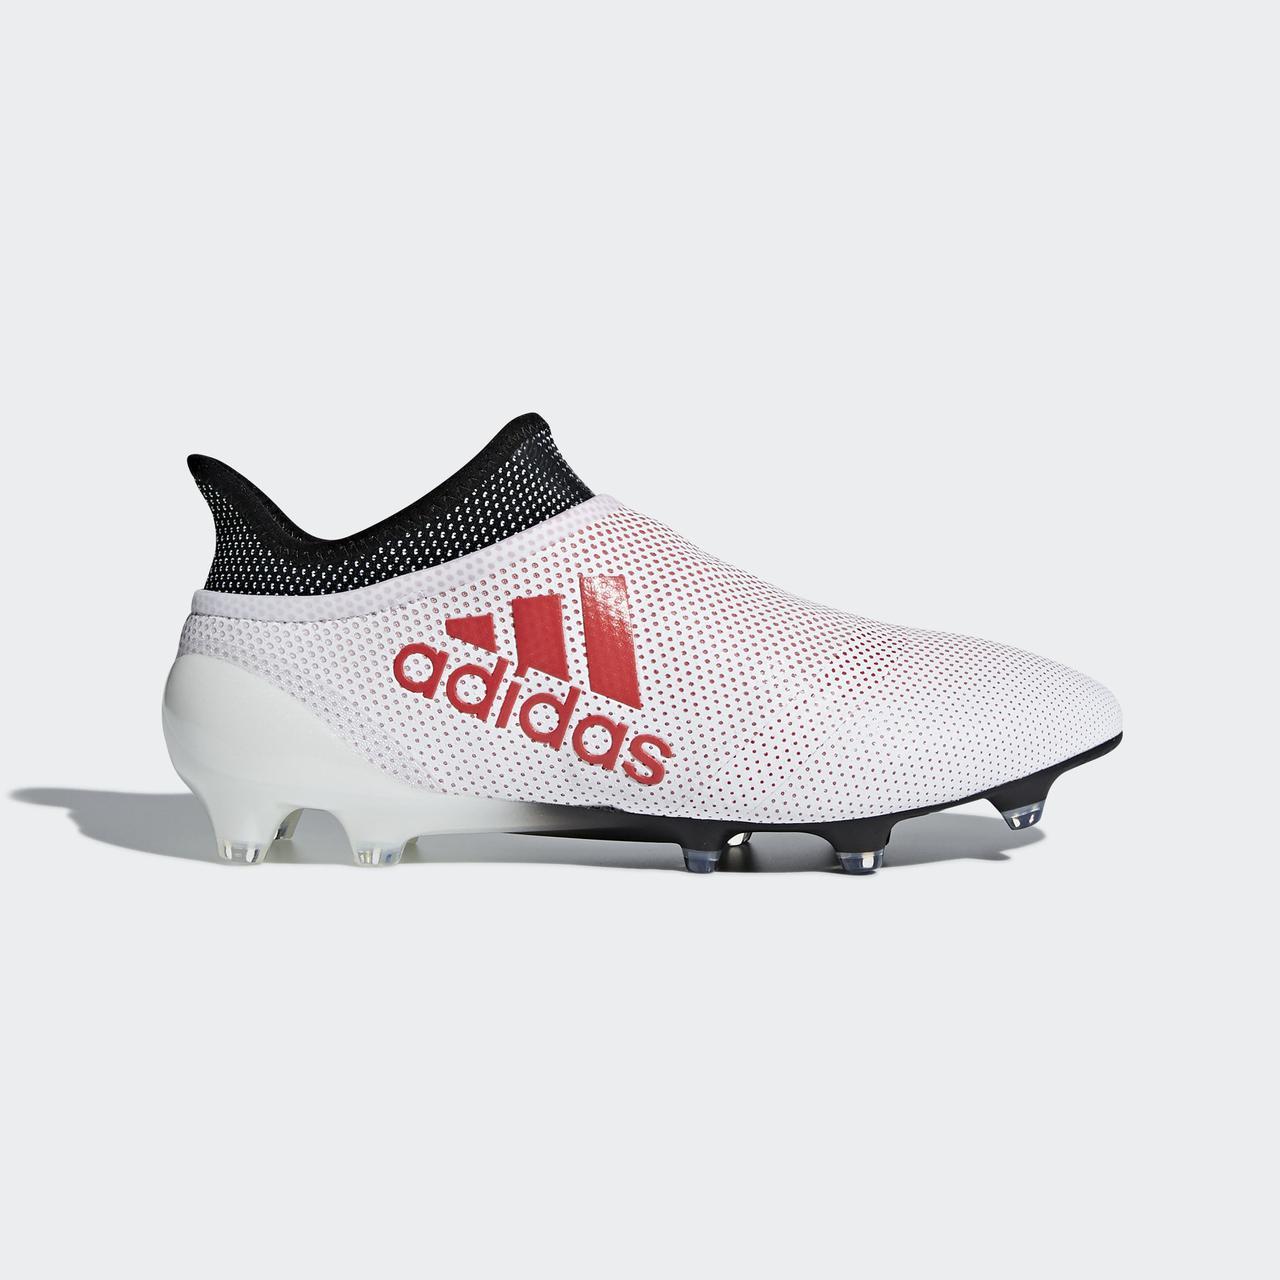 aaf63b45 Футбольные бутсы Adidas Performance X 17+ Purespeed FG (Артикул: CM7712)